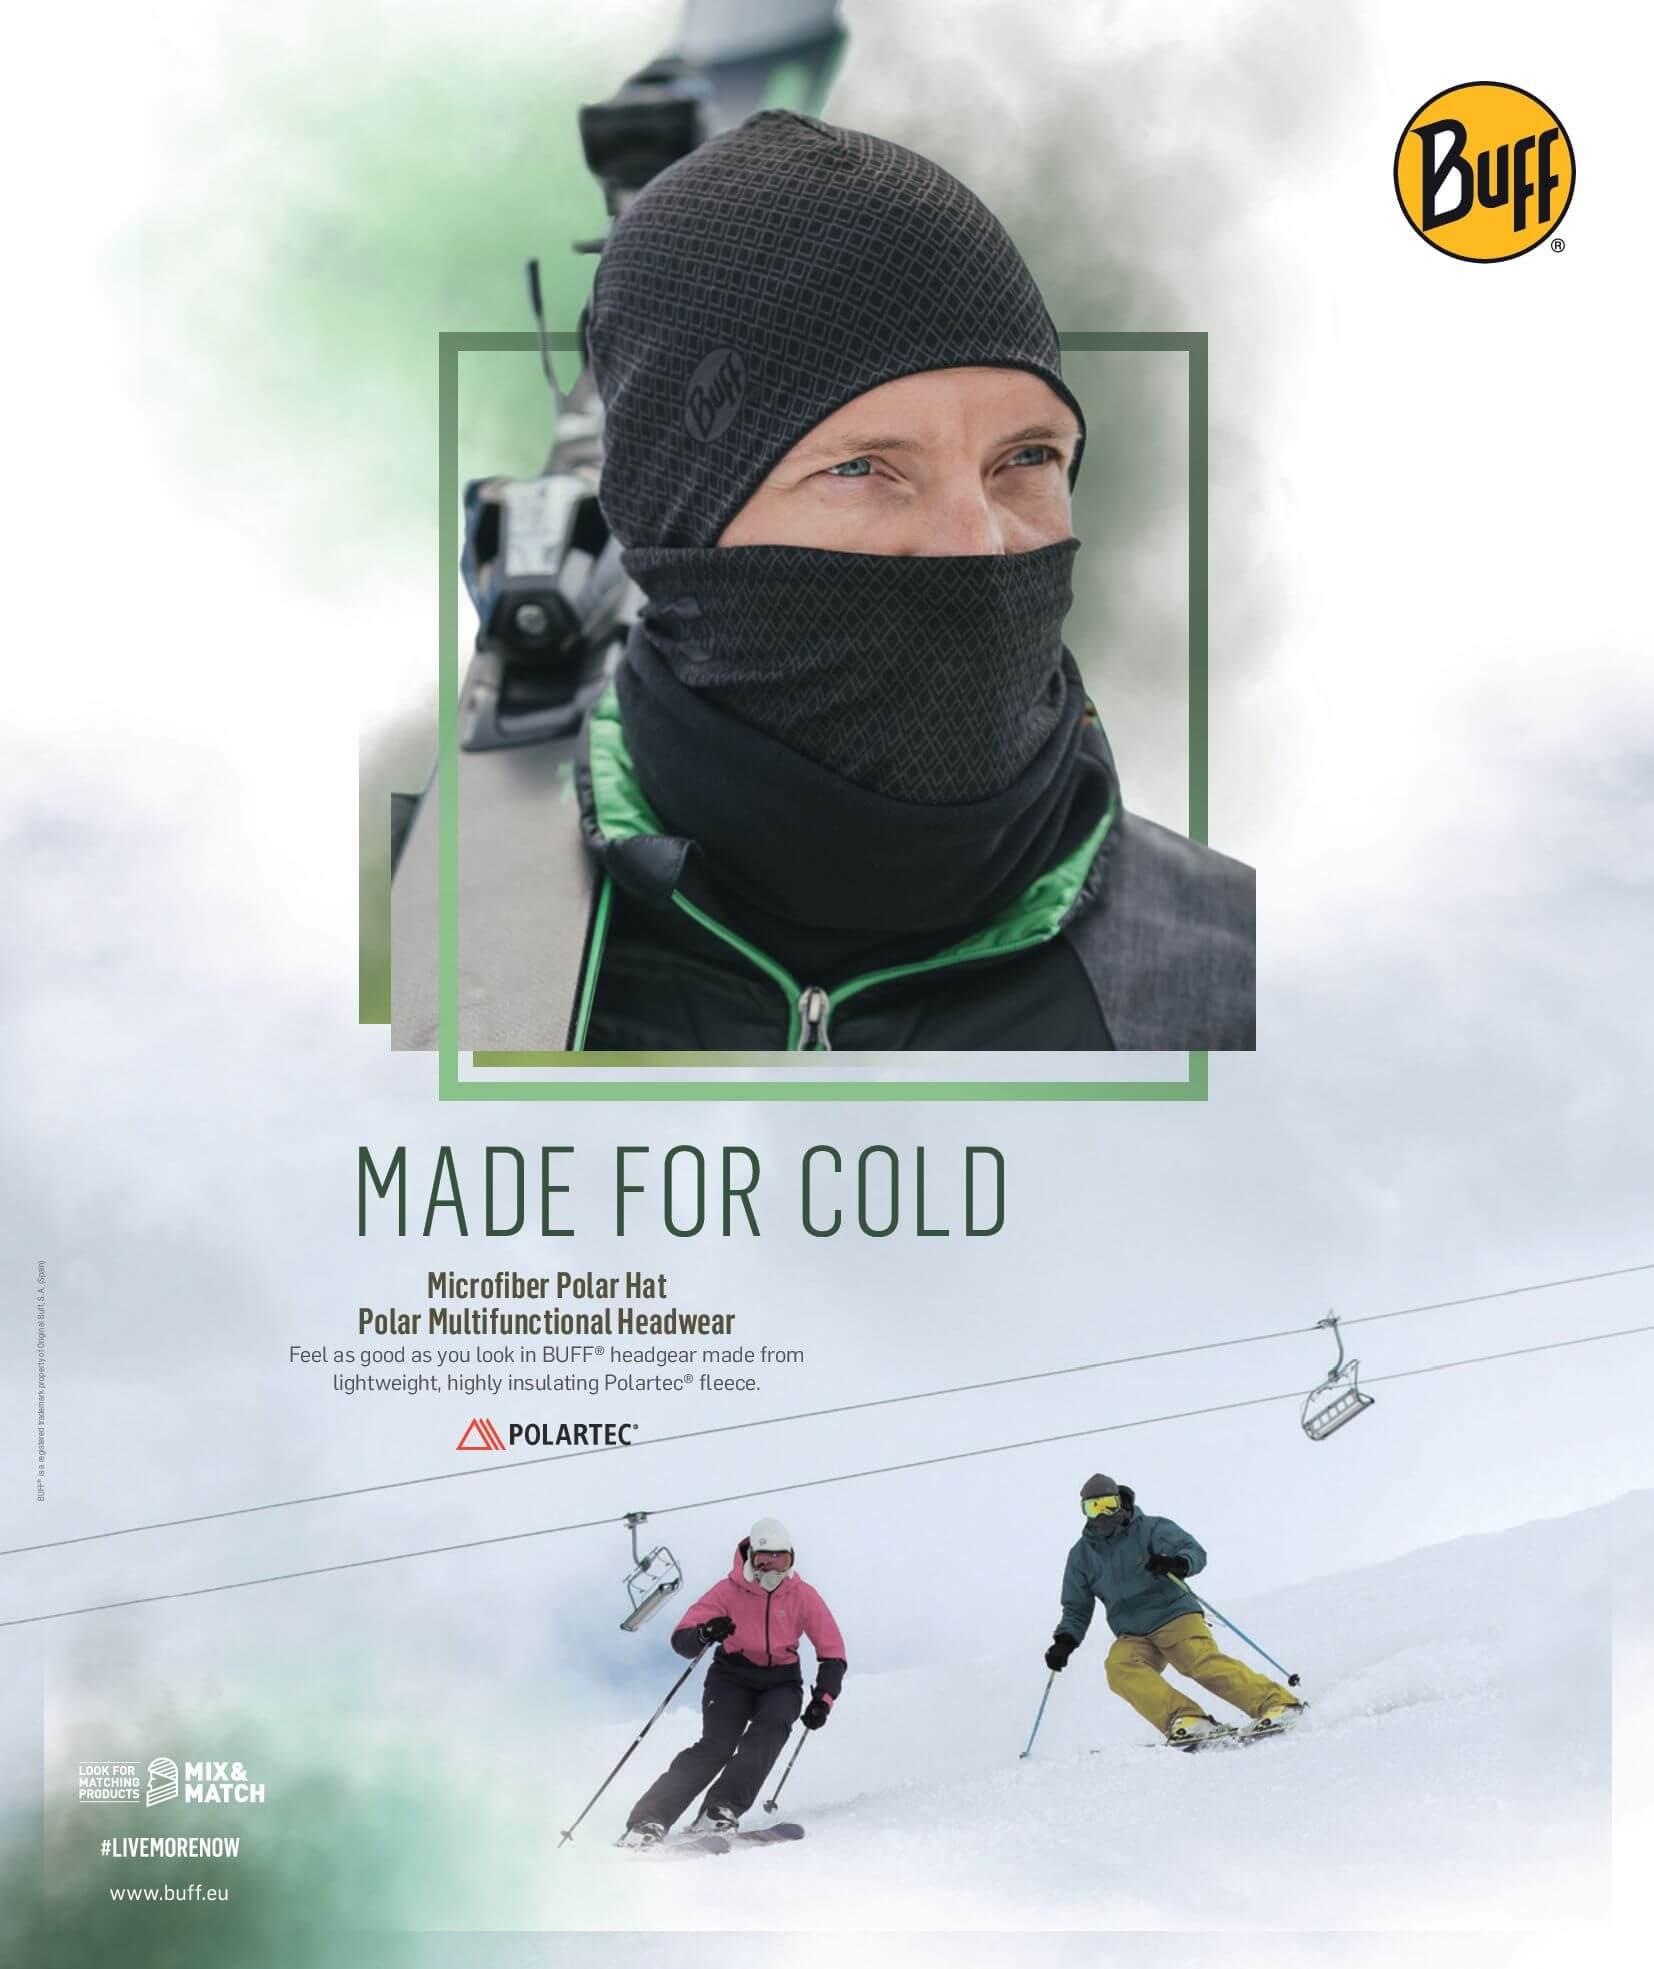 Gazetka Go Sport - Katalog Zima 2017/2018-12.11.2017-28.02.2018-page-95